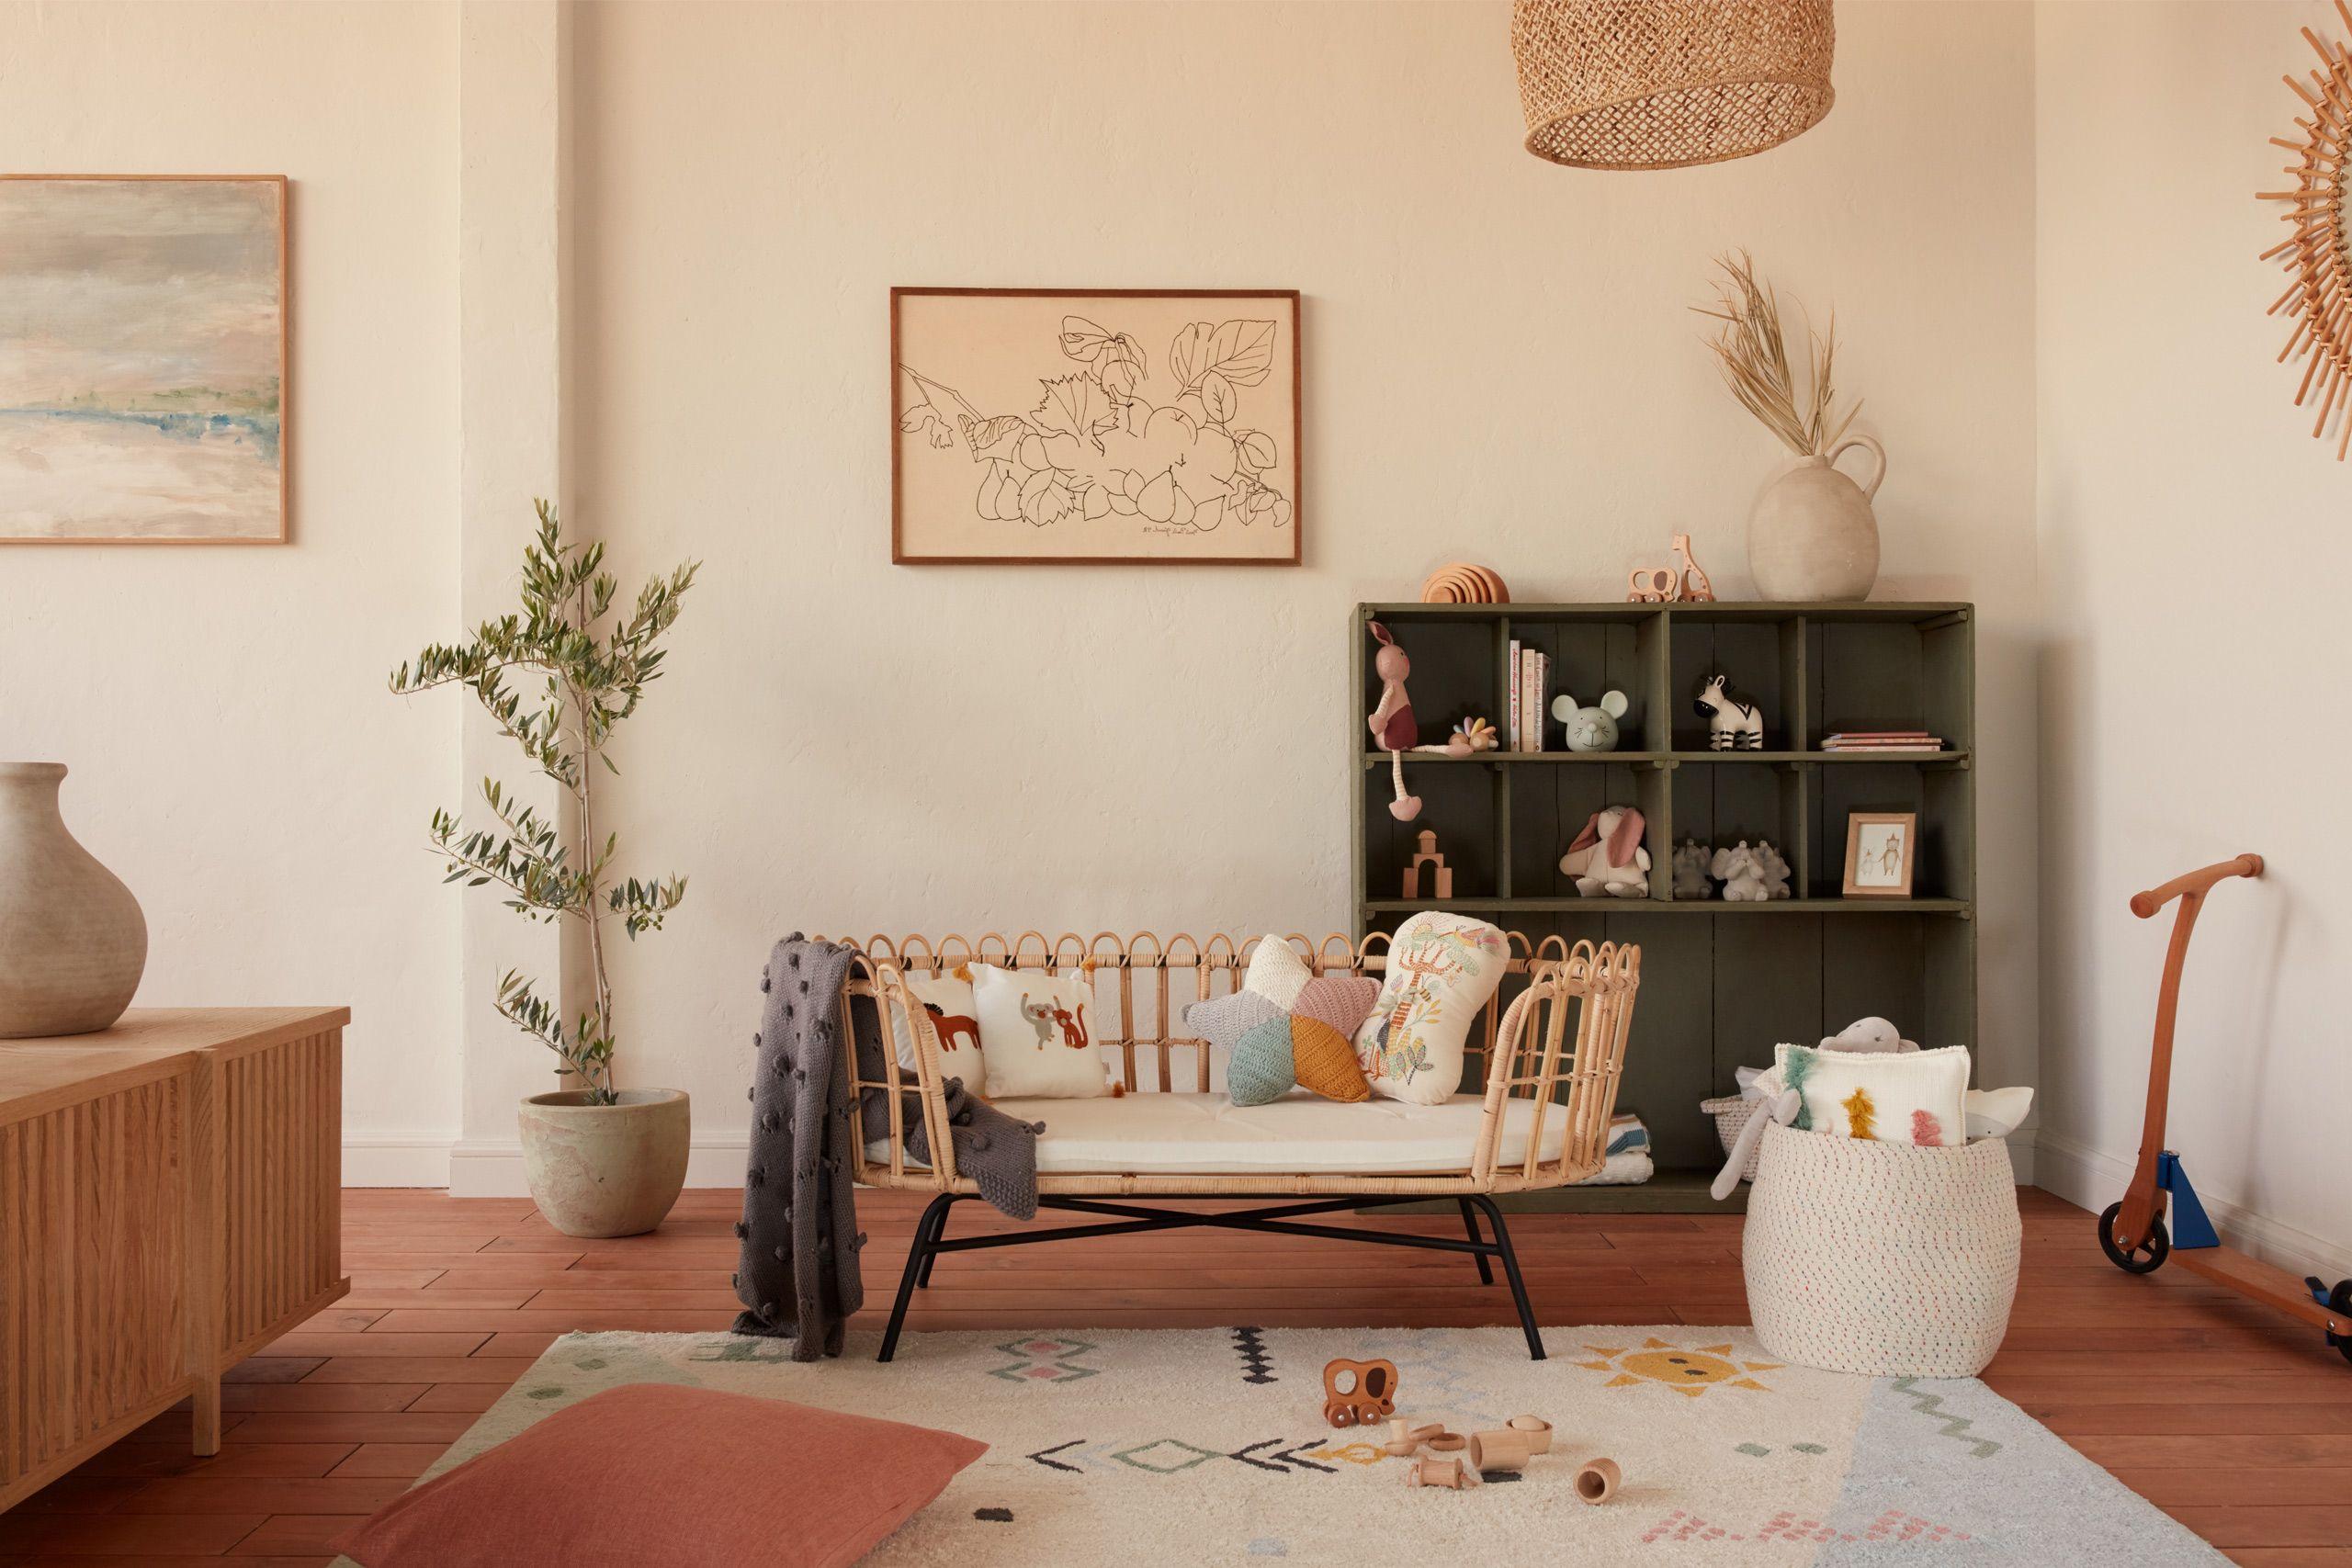 AUTUMN TALES I EDITORIALS Zara Home Deutschland Zara